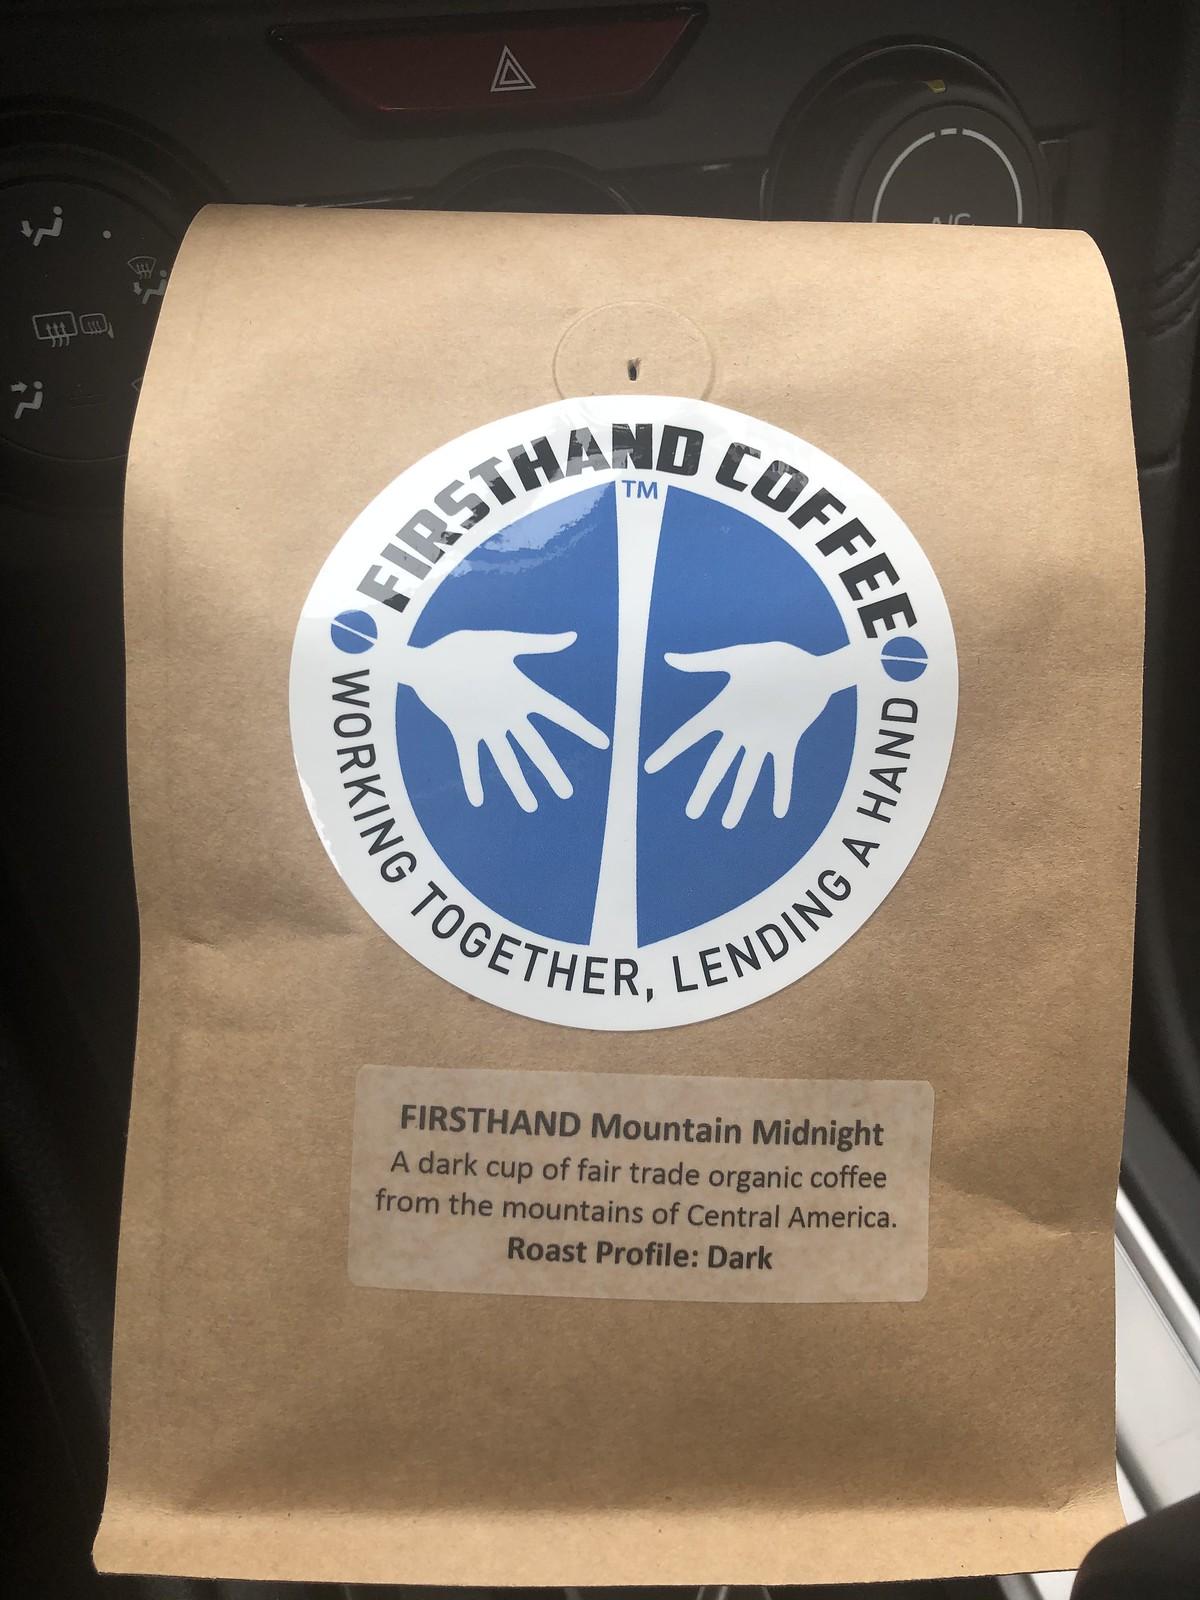 First hand coffee